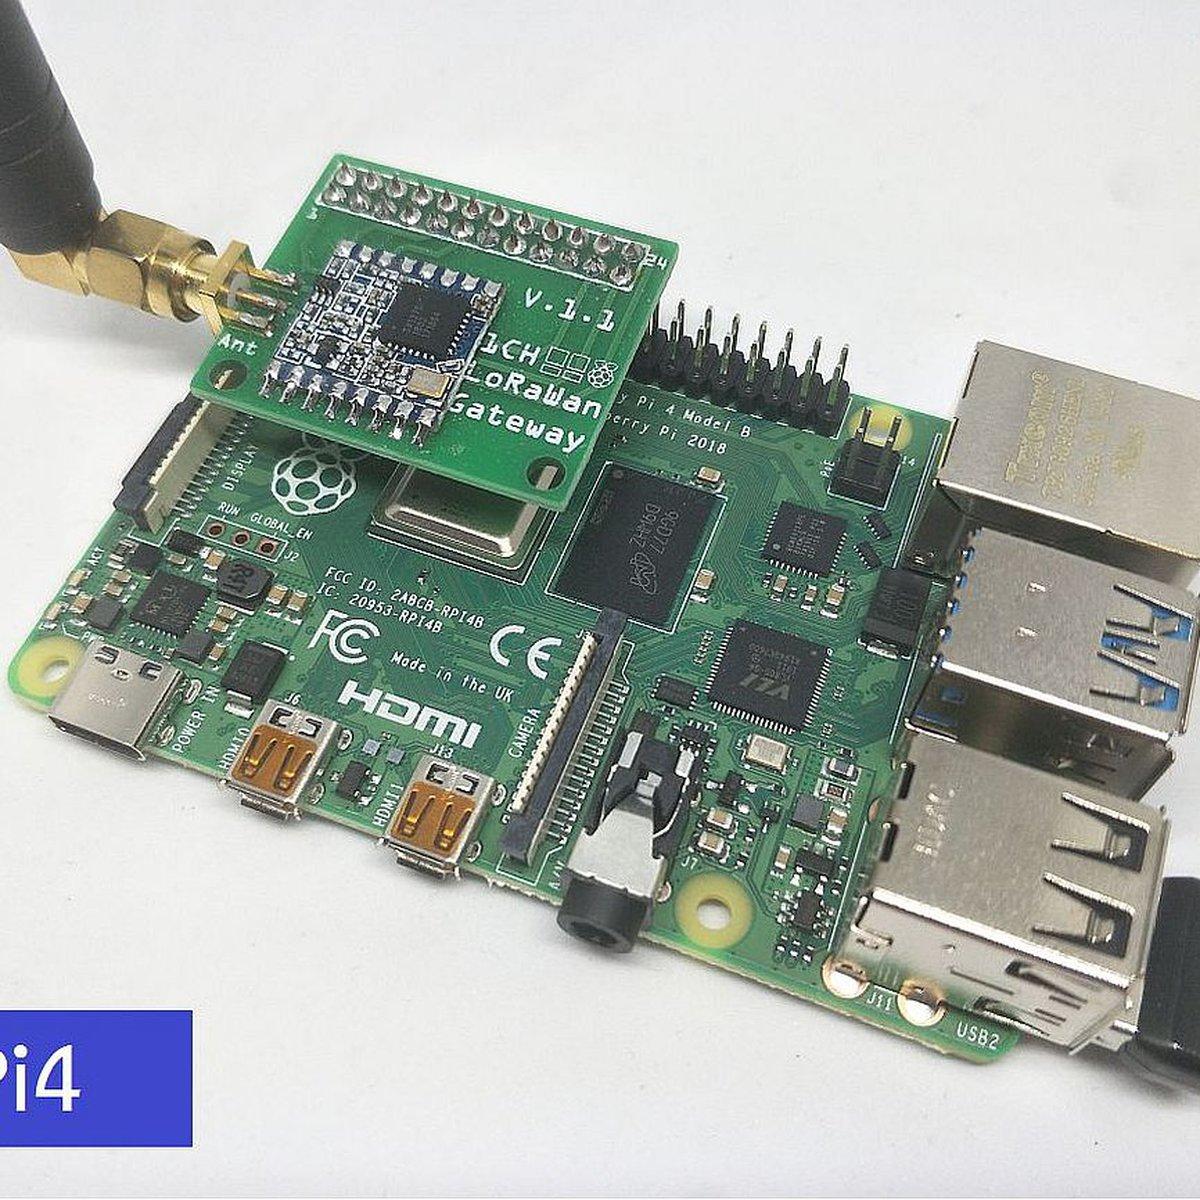 1 Channel LoRaWan Gateway Shield for Raspberry Pi4 from M2M